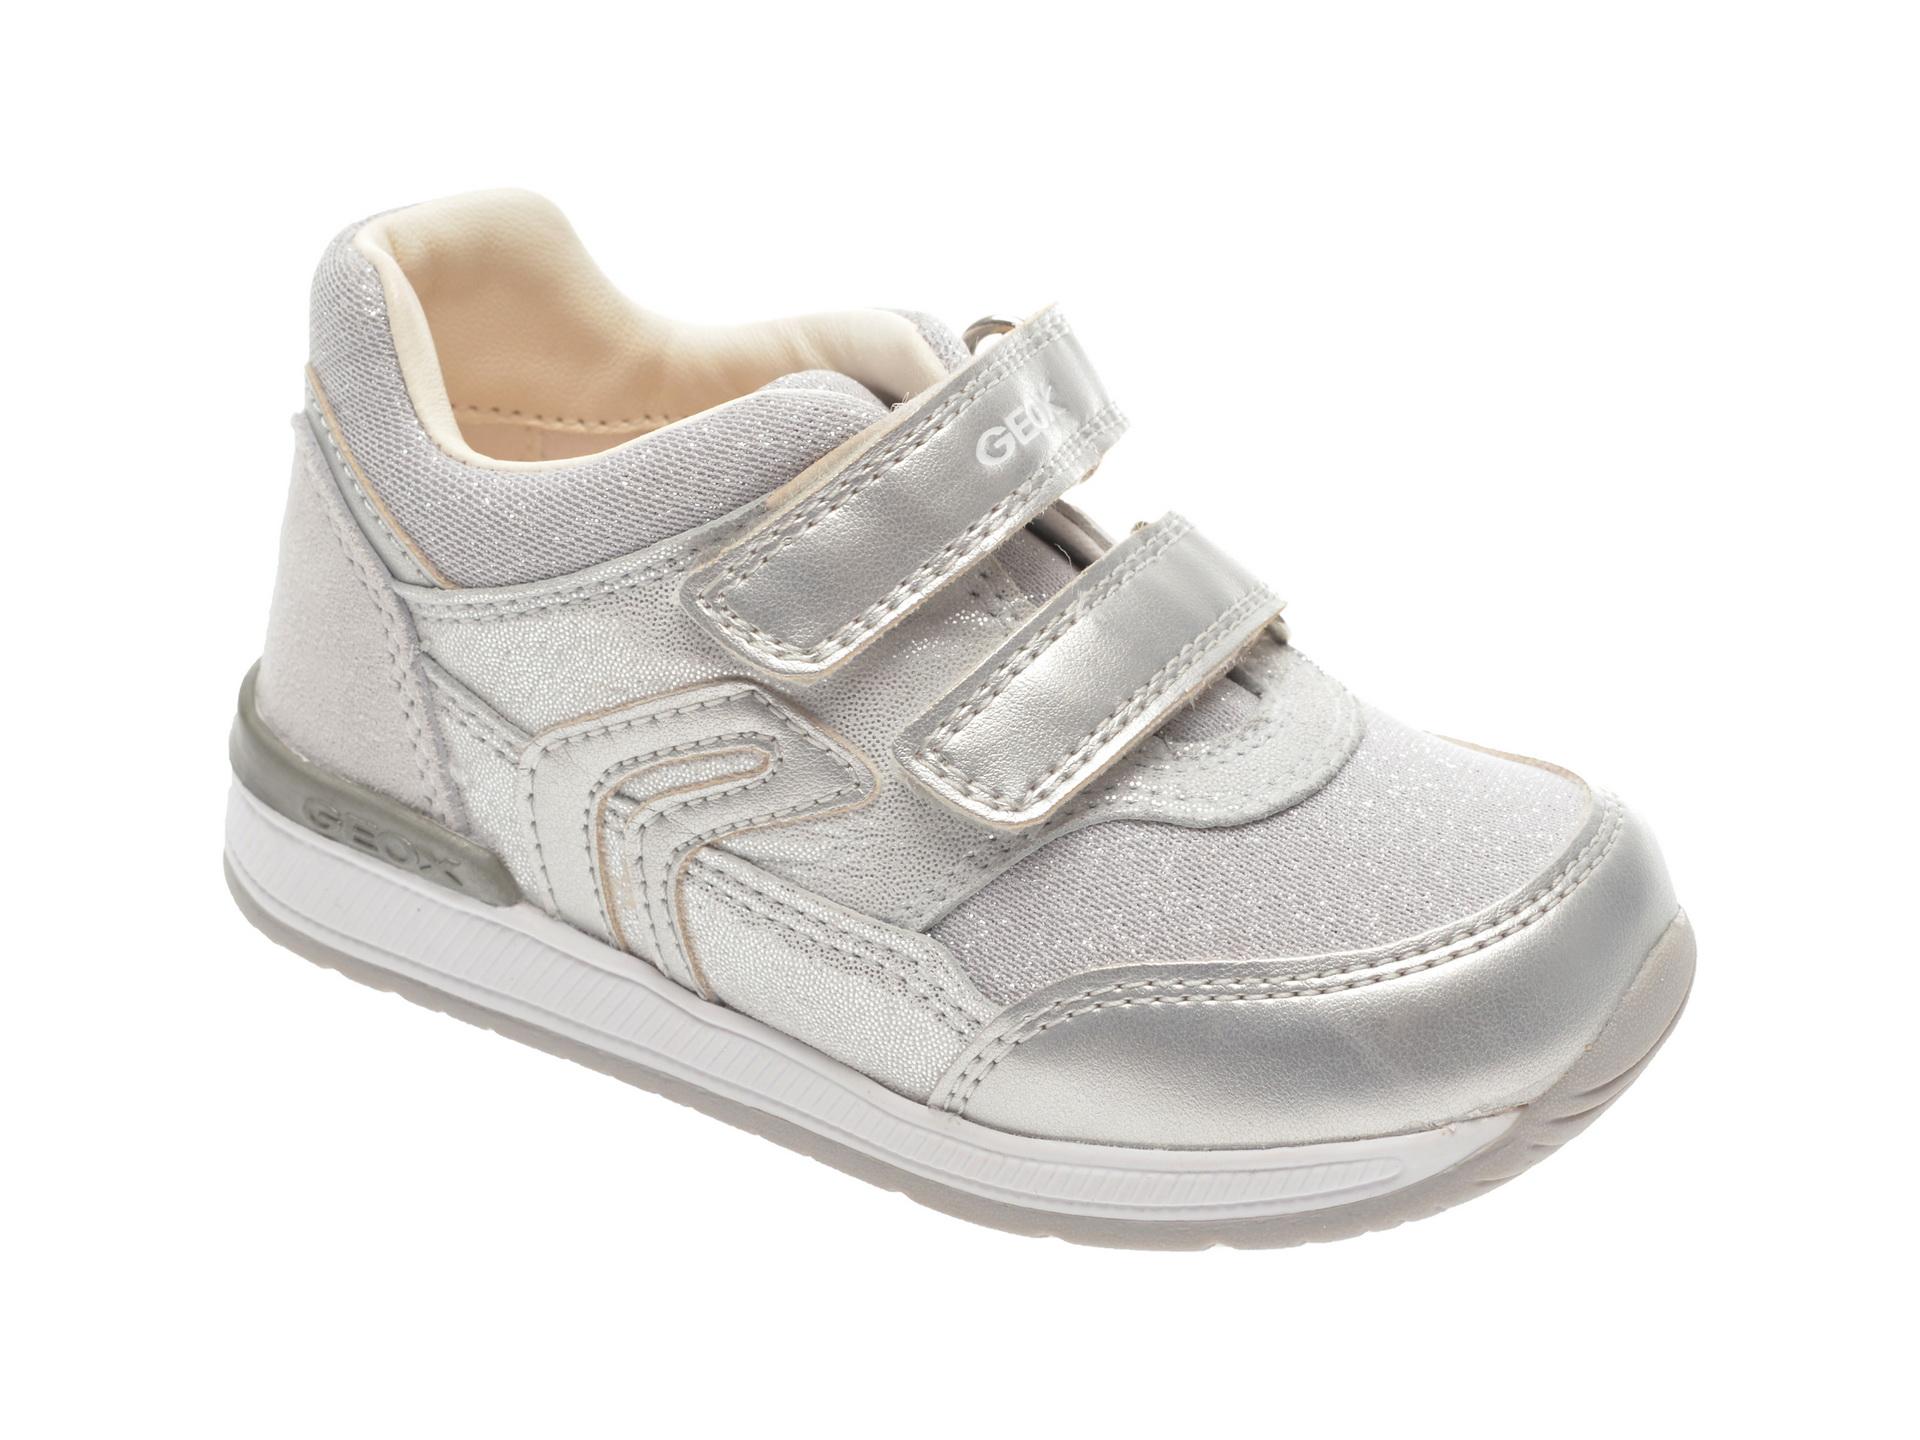 Pantofi sport GEOX argintii, B840LA, din material textil si piele naturala